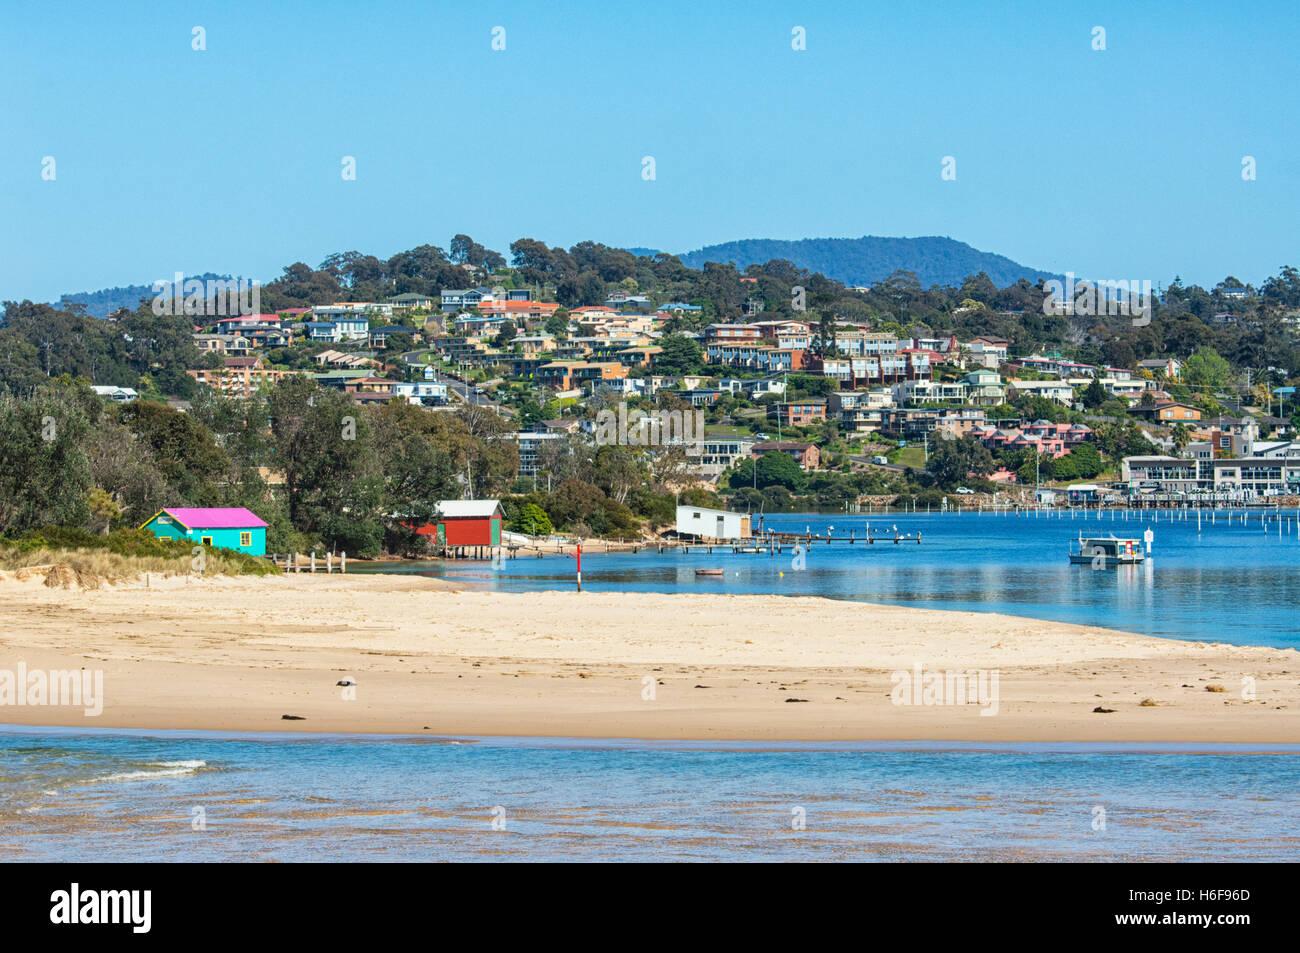 Merimbula, Sapphire Coast, New South Wales, NSW, Australia - Stock Image